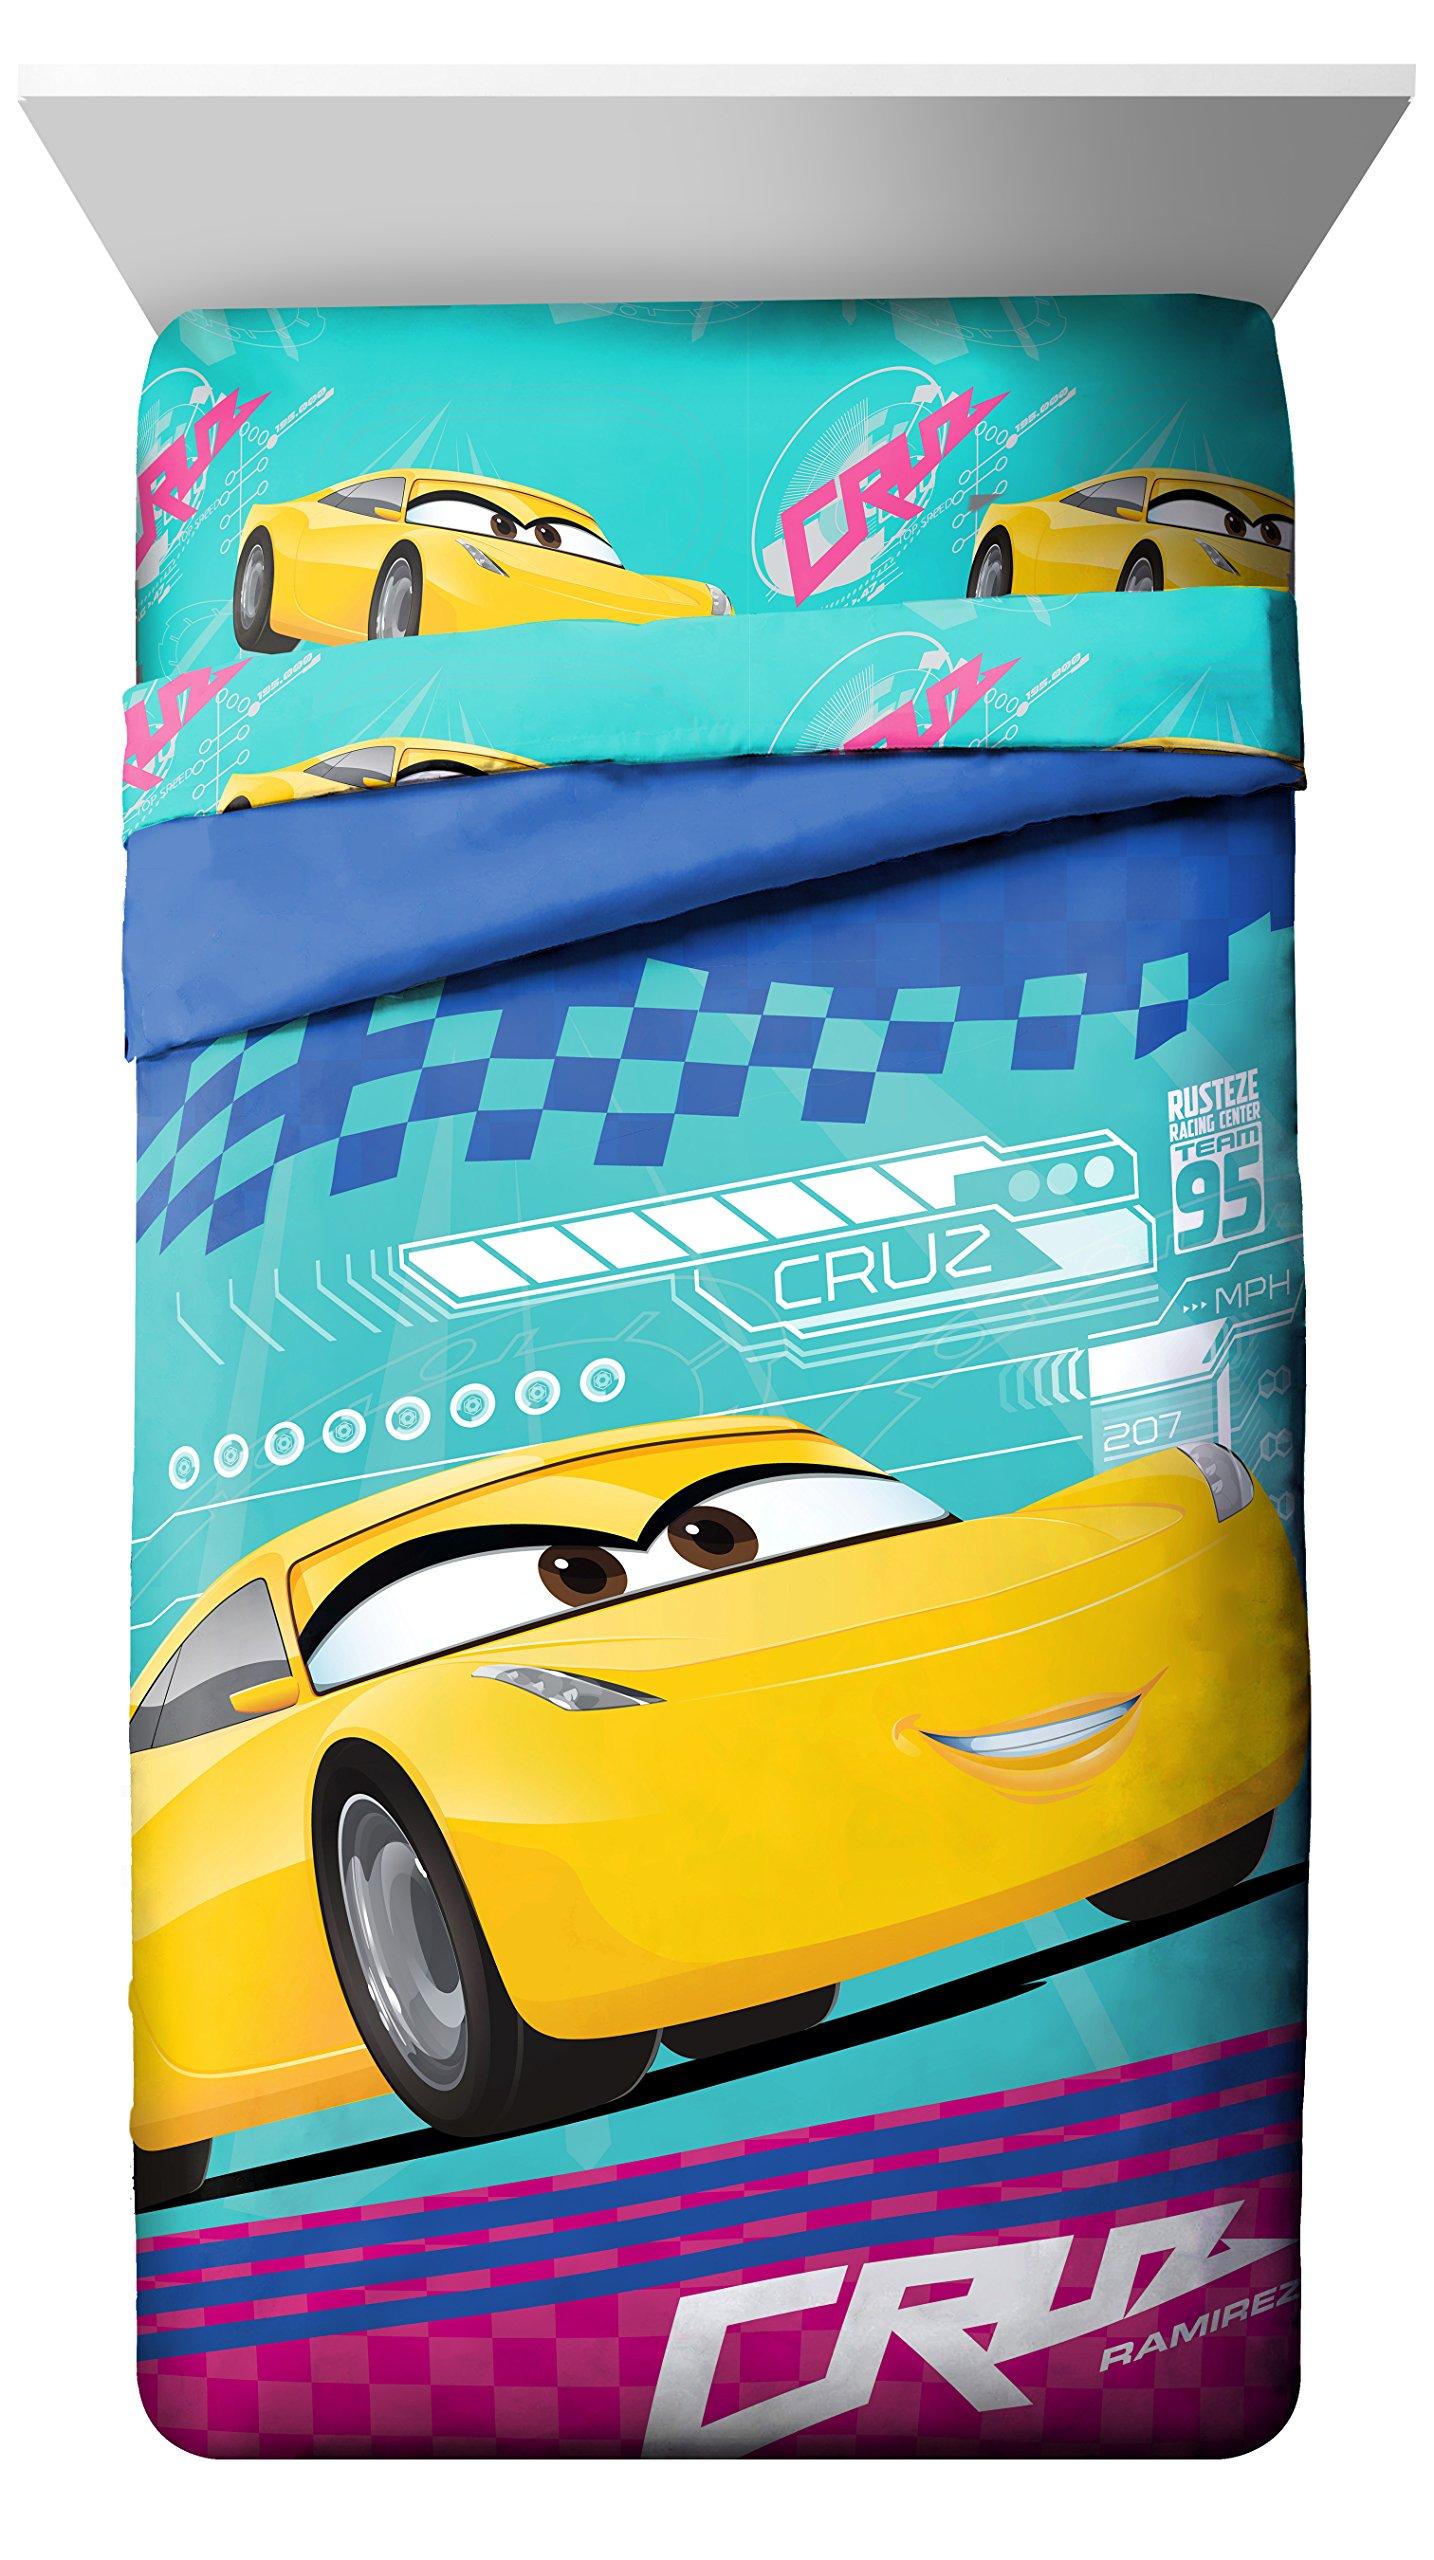 Disney/Pixar Cars 3 Movie Cruz Twin/Full Reversible Yellow/Teal/Pink/Blue Comforter with Cruz Ramirez (Official Disney/Pixar Product)